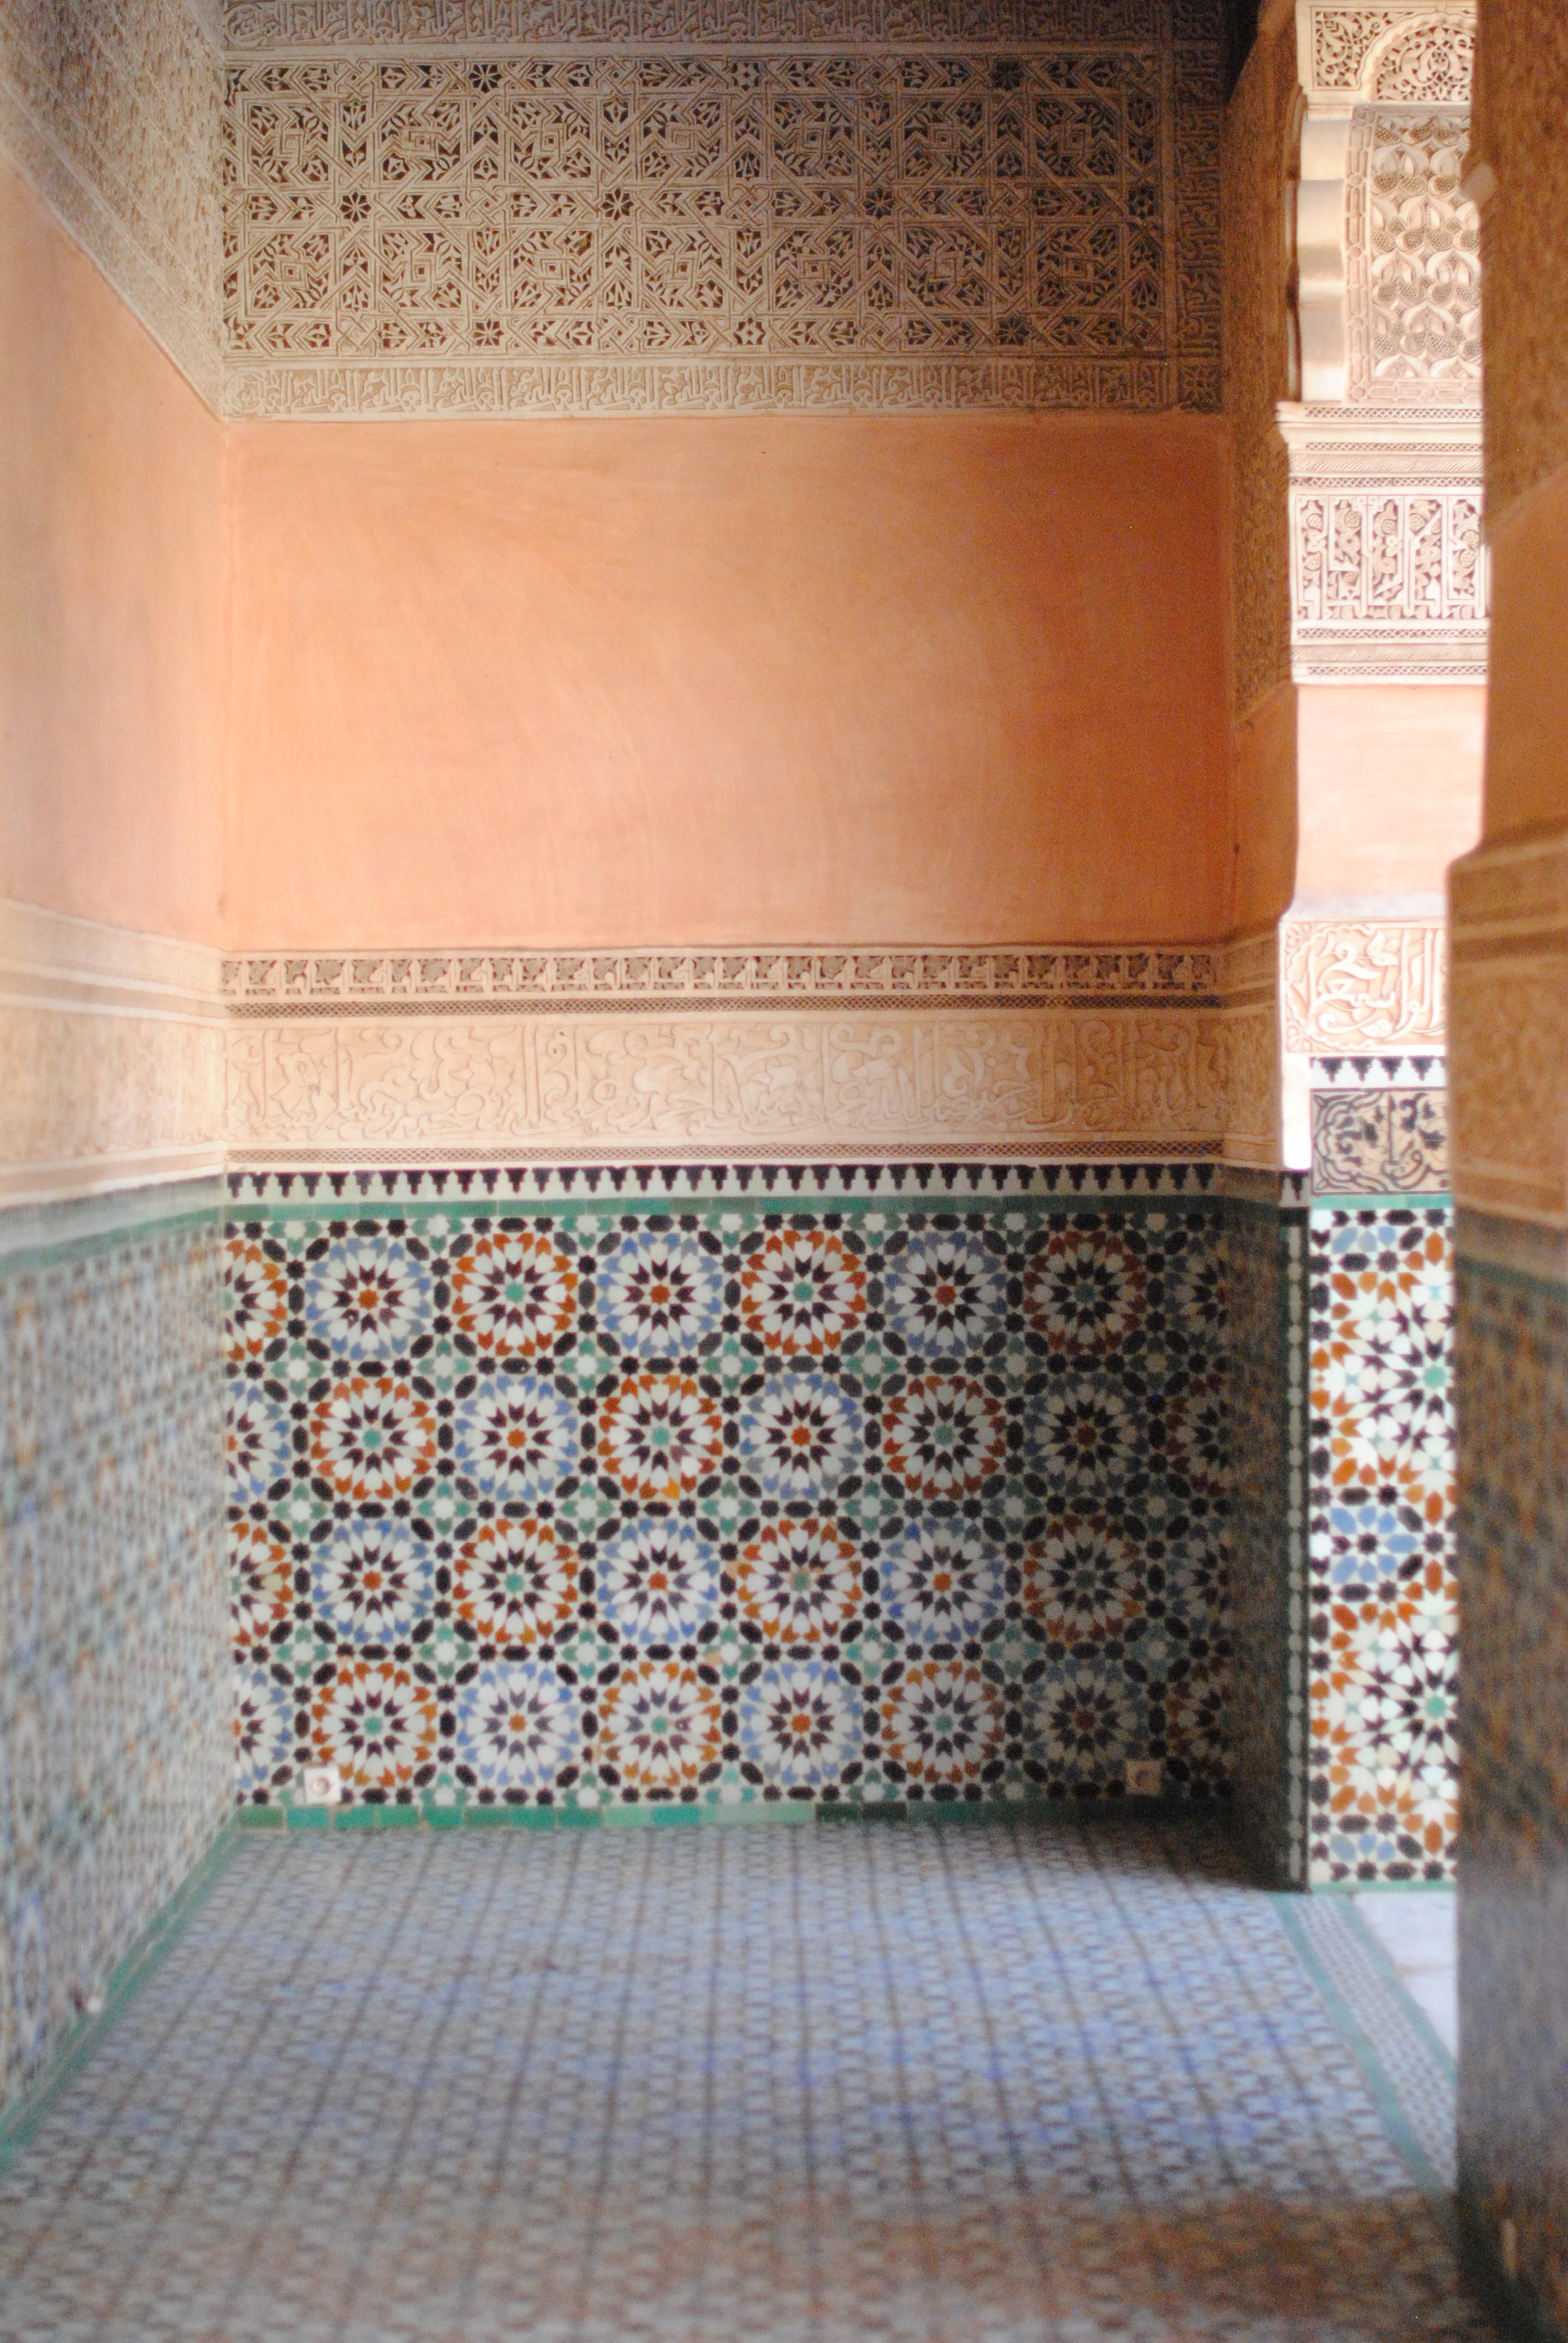 ben-youssef-madrasa-architecture-mozaics